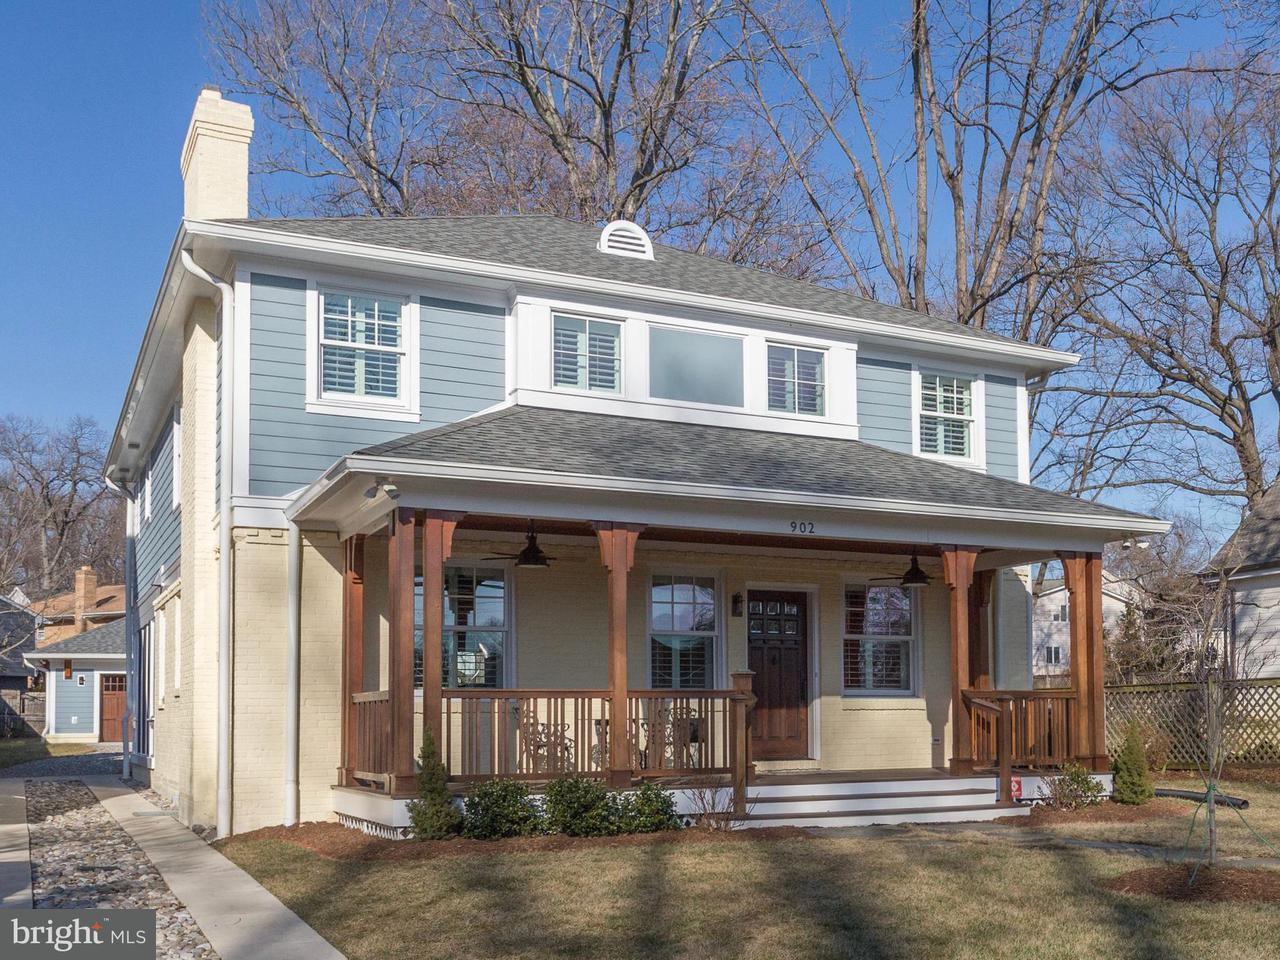 獨棟家庭住宅 為 出售 在 902 Lincoln Avenue 902 Lincoln Avenue Falls Church, 弗吉尼亞州 22046 美國